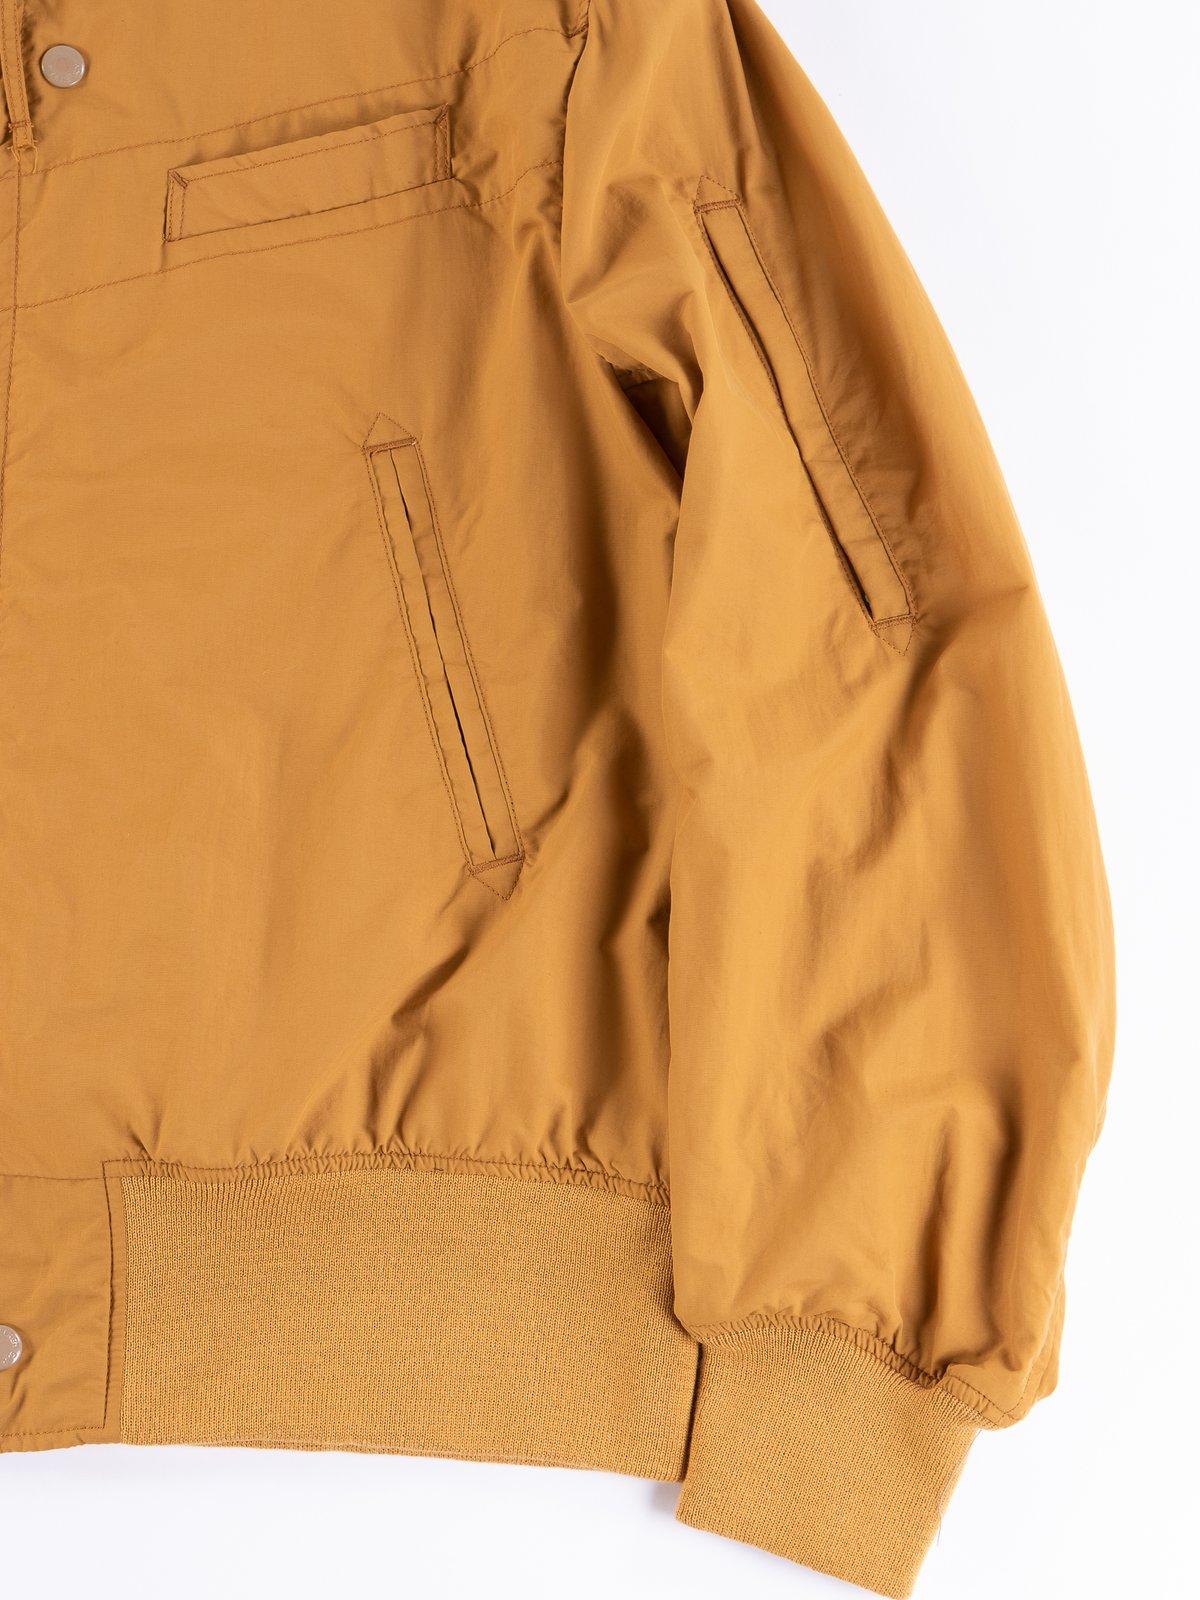 Mustard Acrylic Coated Nylon Taffeta Aviator Jacket - Image 4